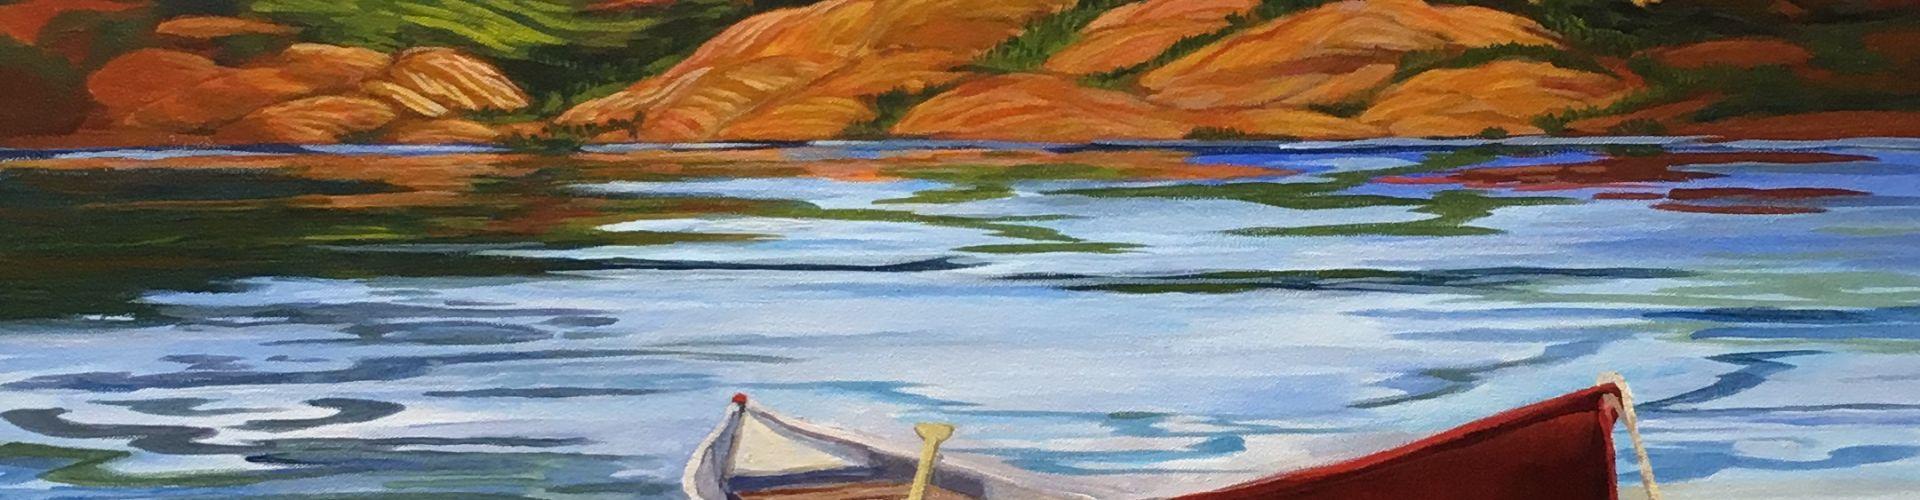 An Okanagan Summer painting by Linda Lovisa